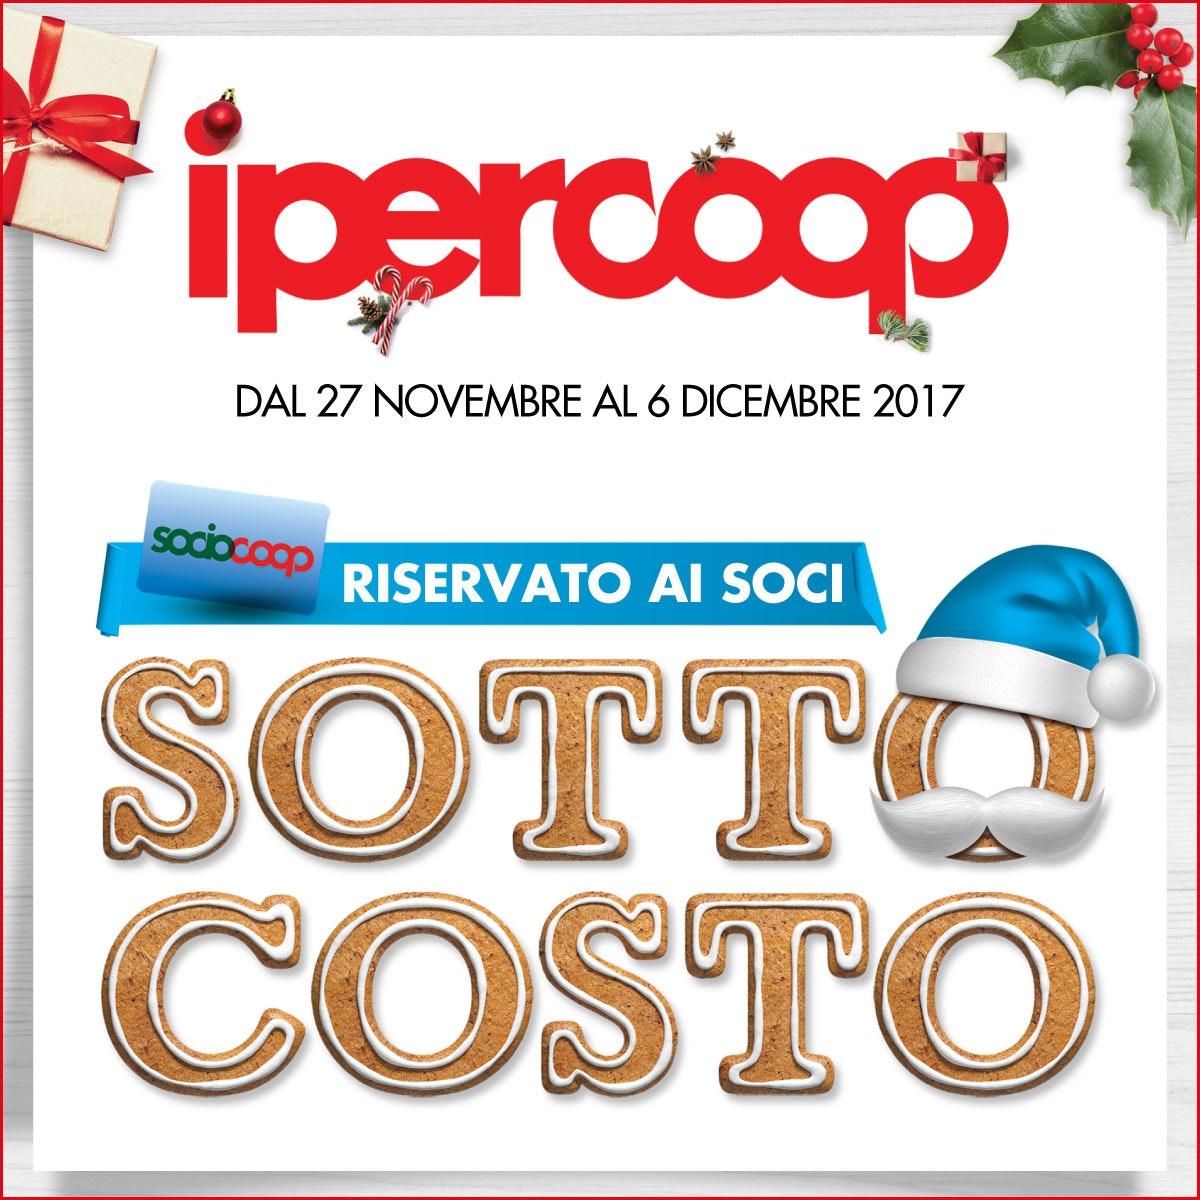 Beautiful Volantino Ipercoop La Spezia Le Terrazze Ideas - Casa ...